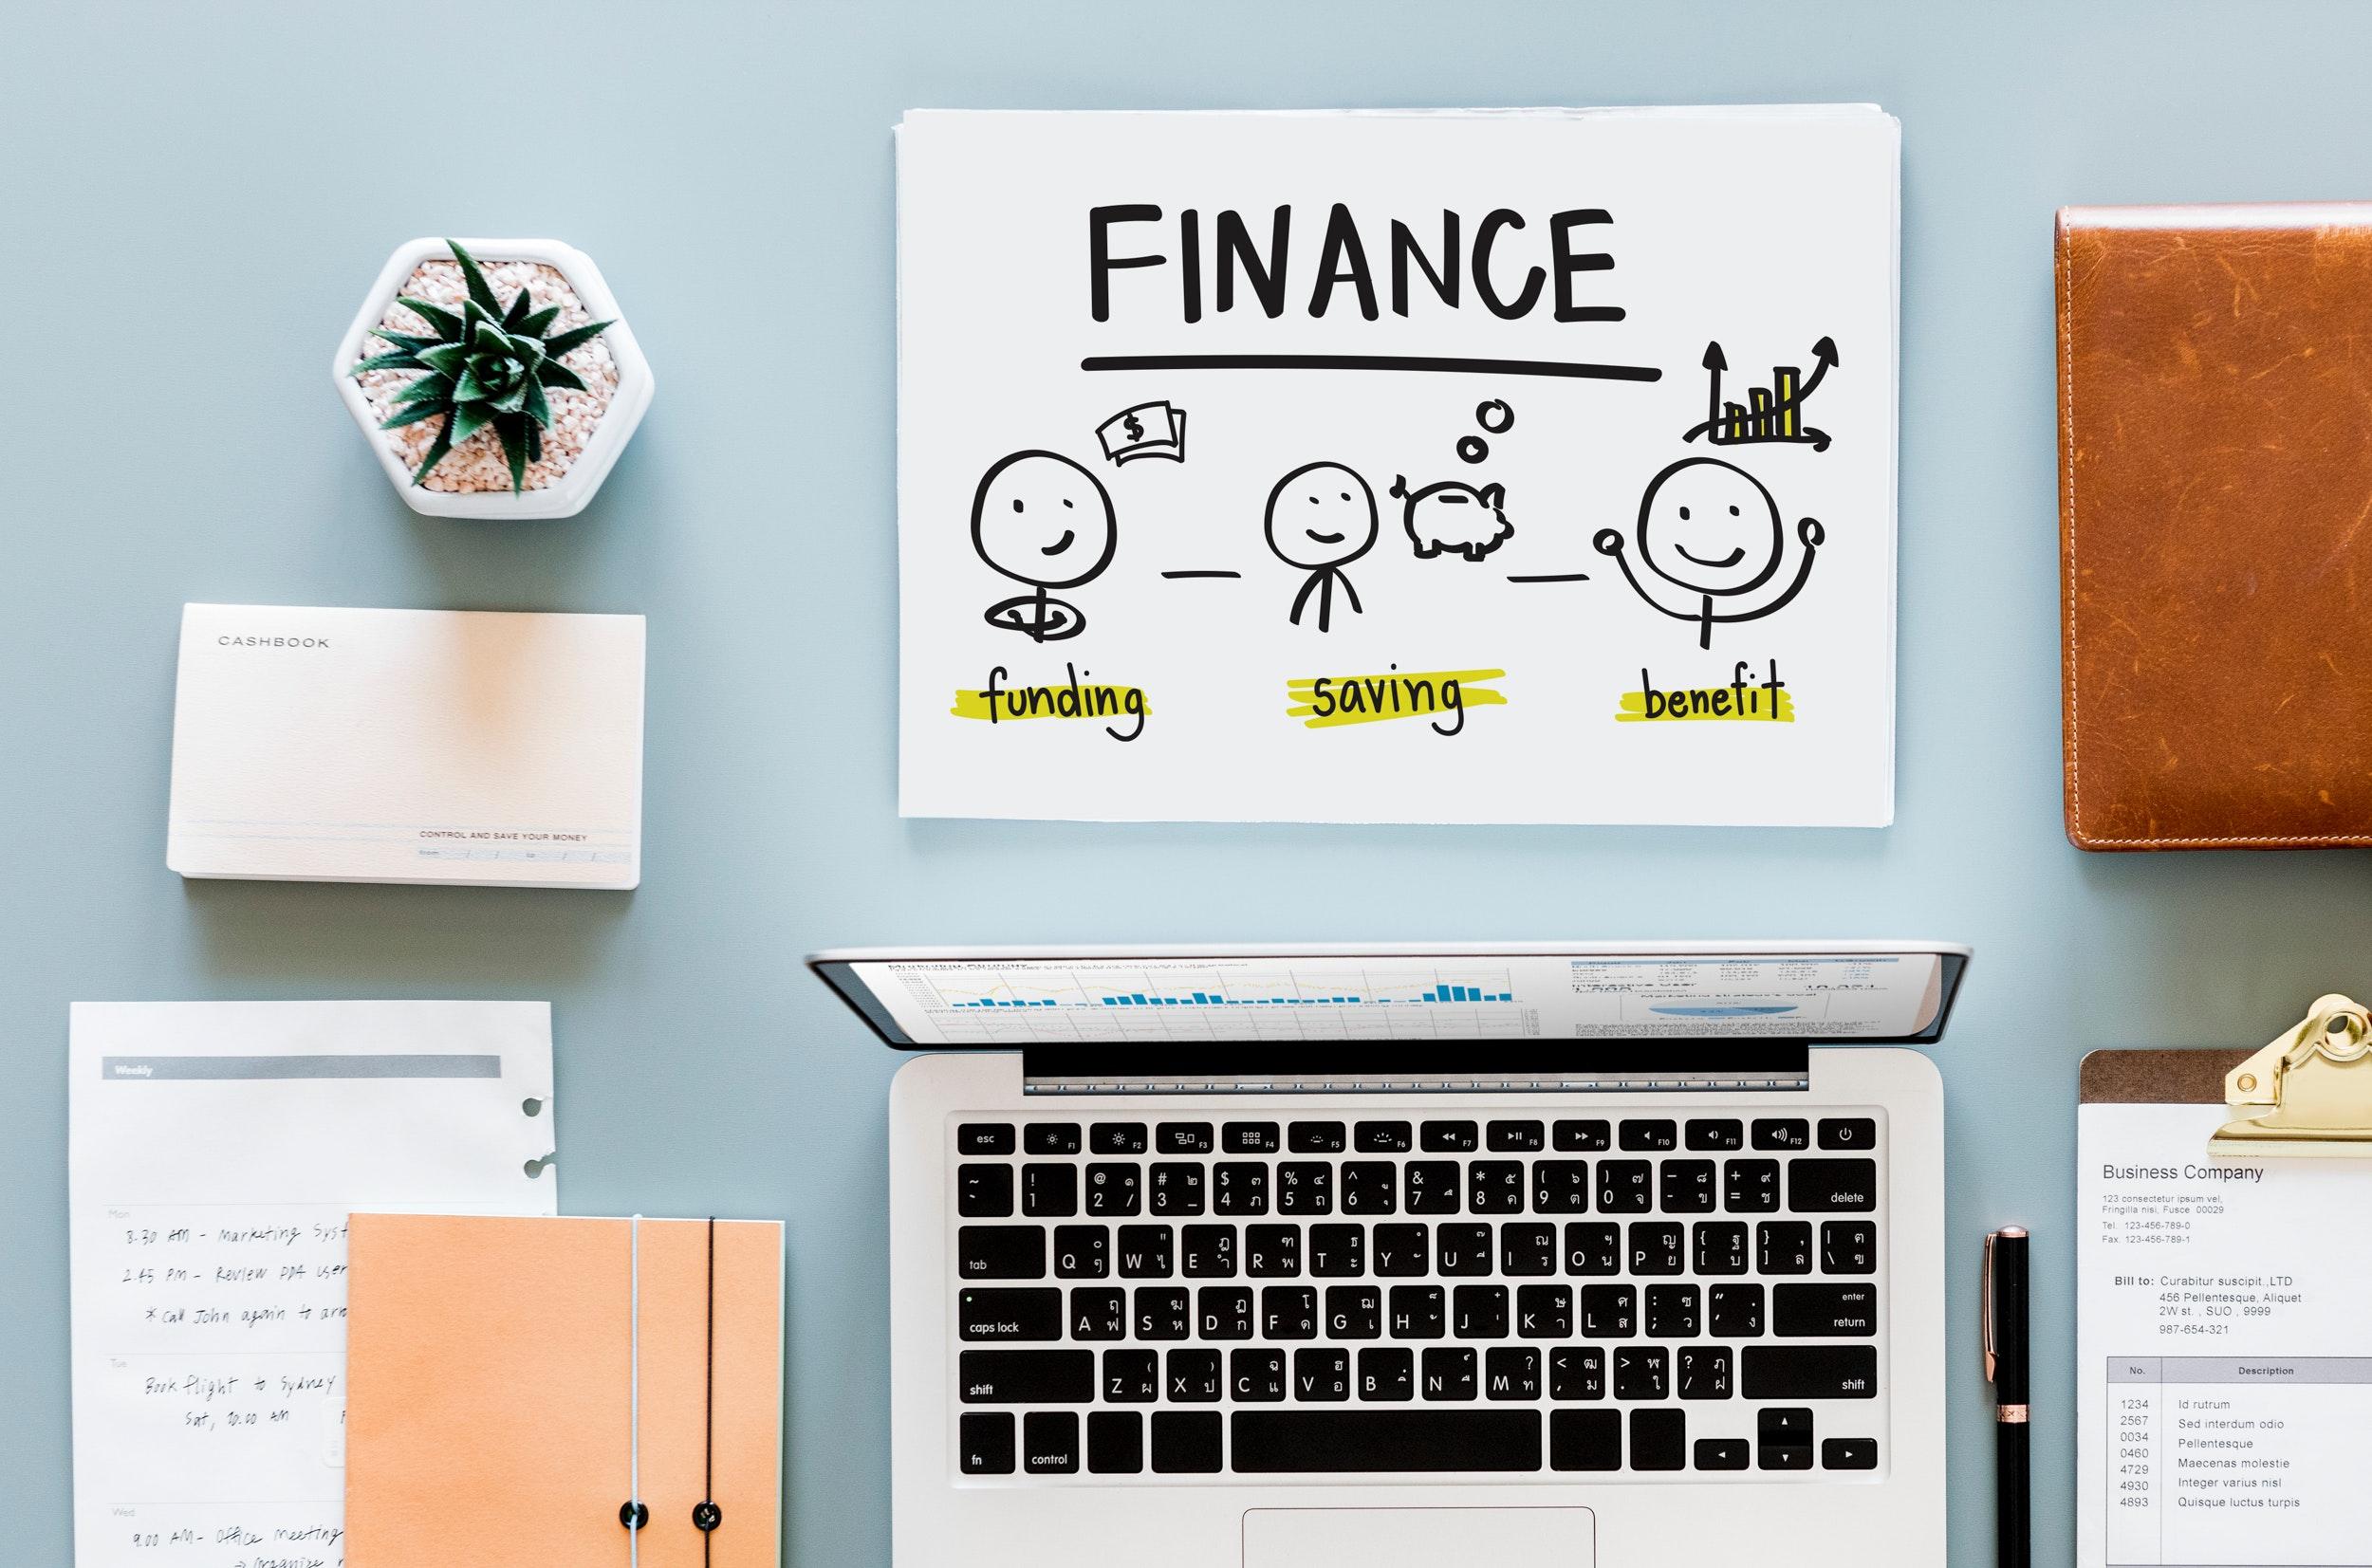 Finance sketch near laptop computer photo